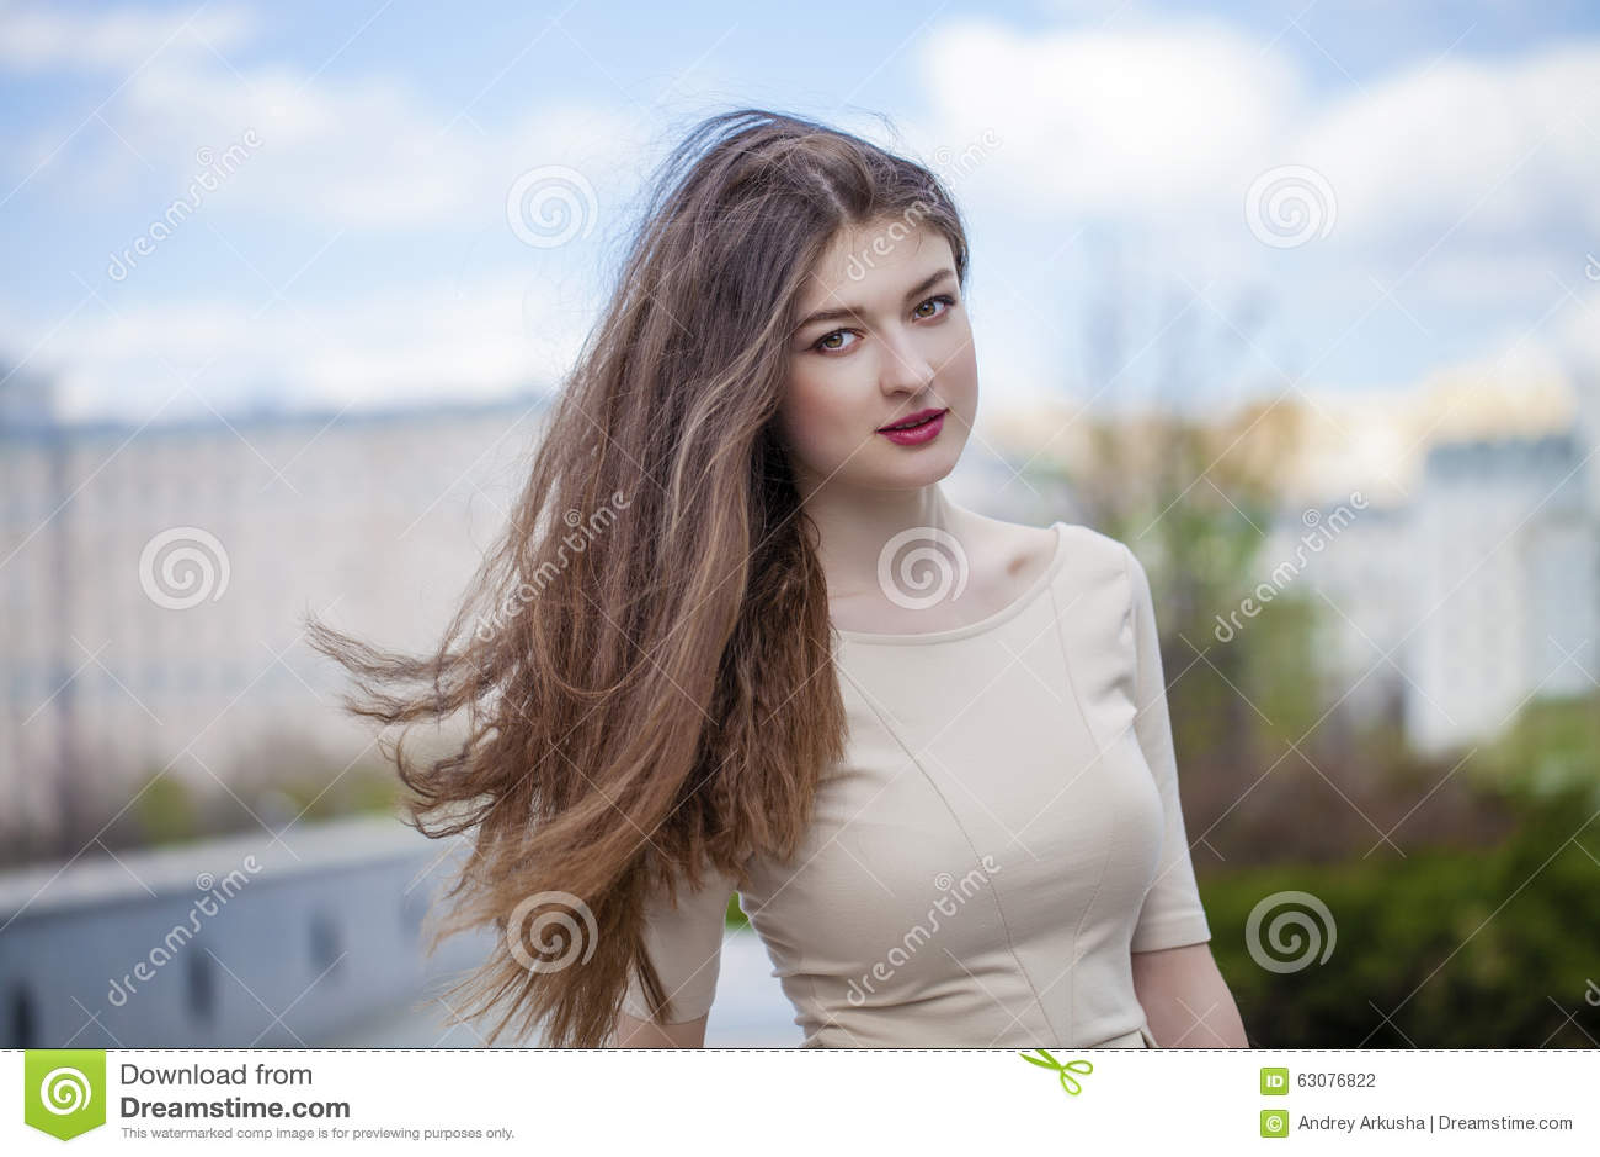 Download Jeune Belle Femme Dans Une Robe Beige Photo stock - Image du mode, dame: 63076822